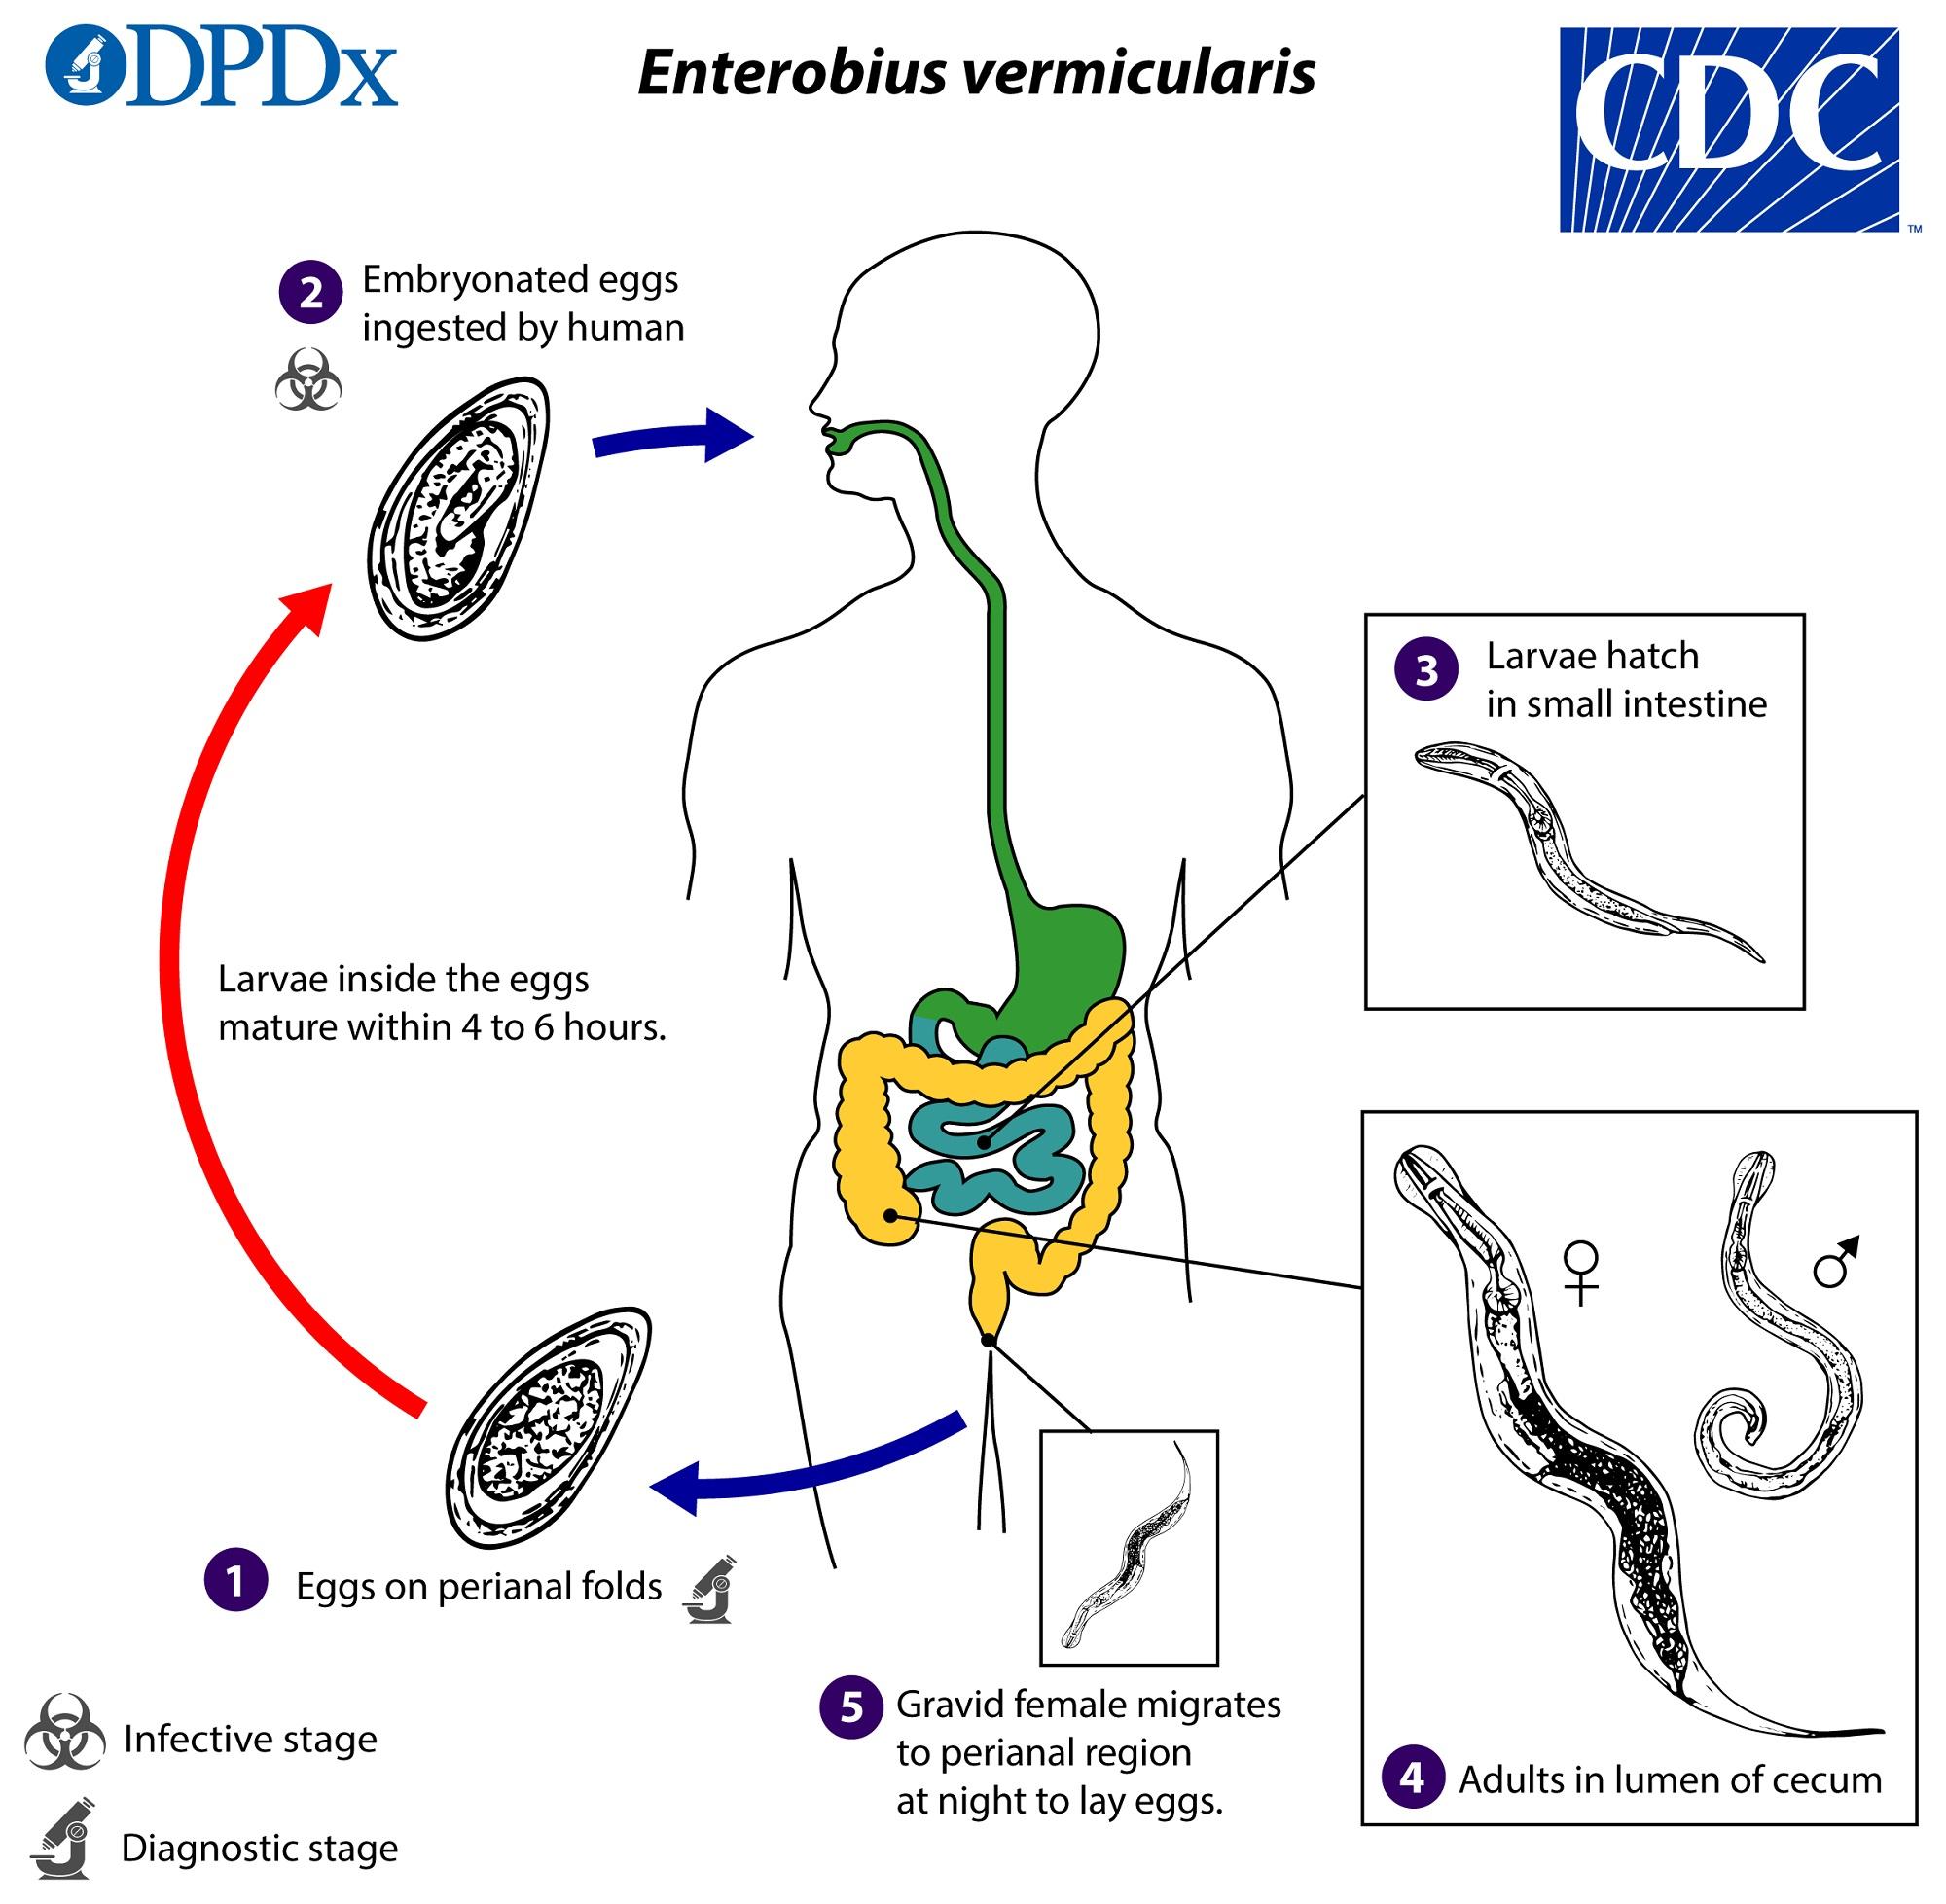 enterobius vermicularis diagnózisa és kezelése